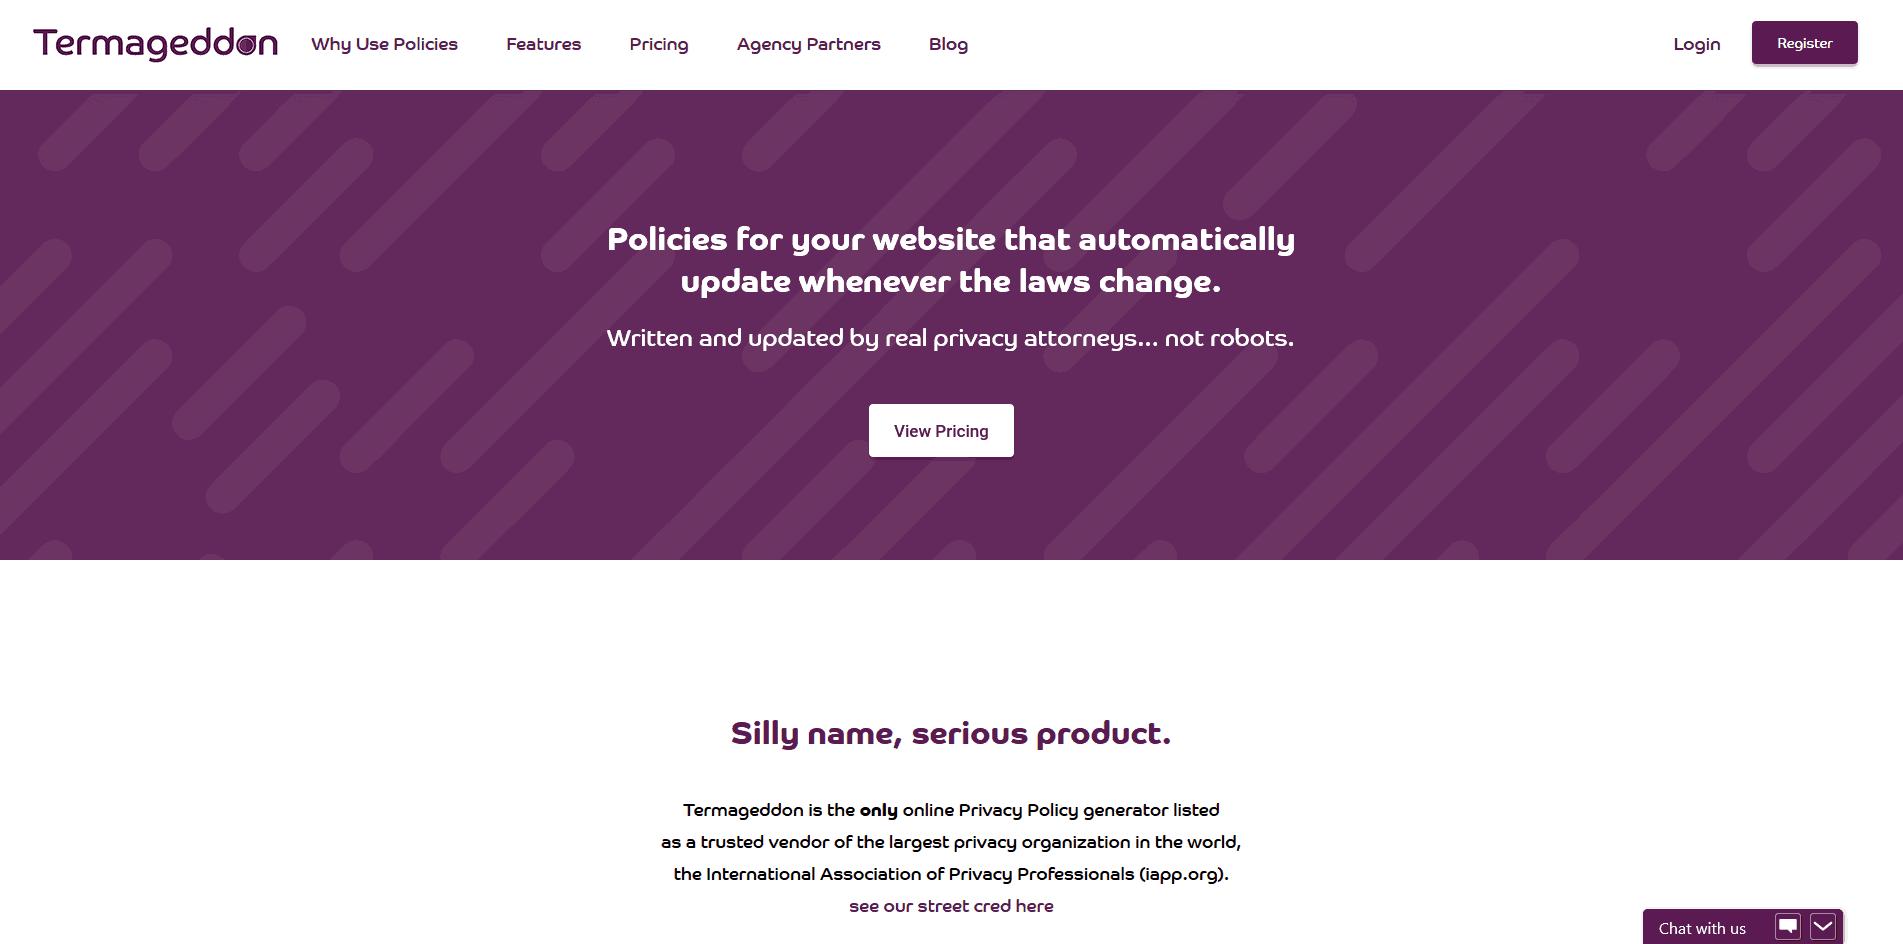 termageddon website screenshot